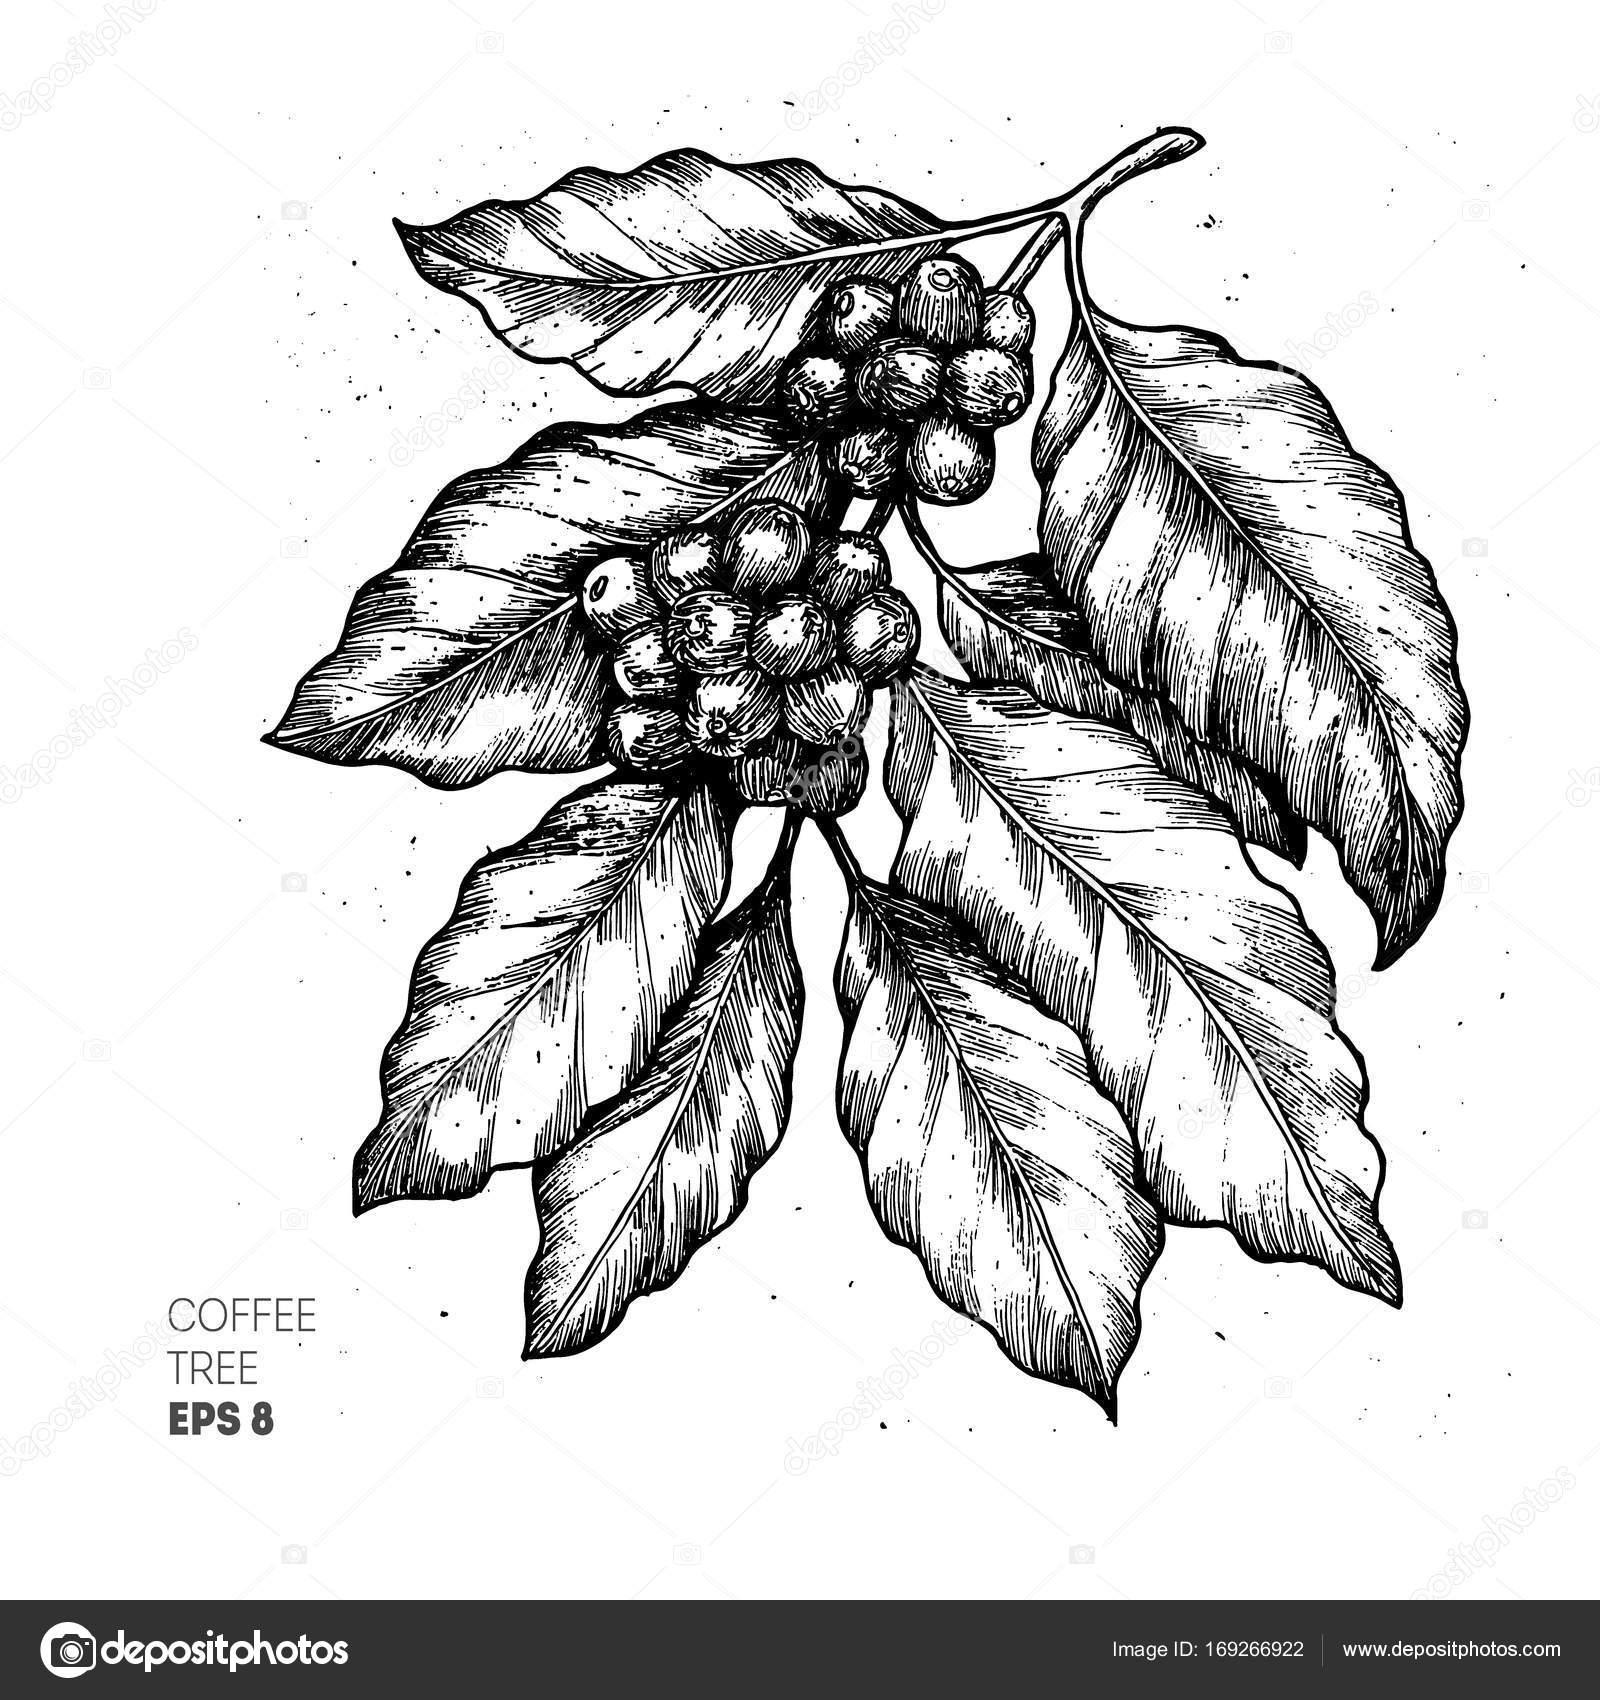 Coffee tree illustration engraved style illustration vintage coffee tree illustration engraved style illustration vintage coffee vector illustration stock vector altavistaventures Gallery